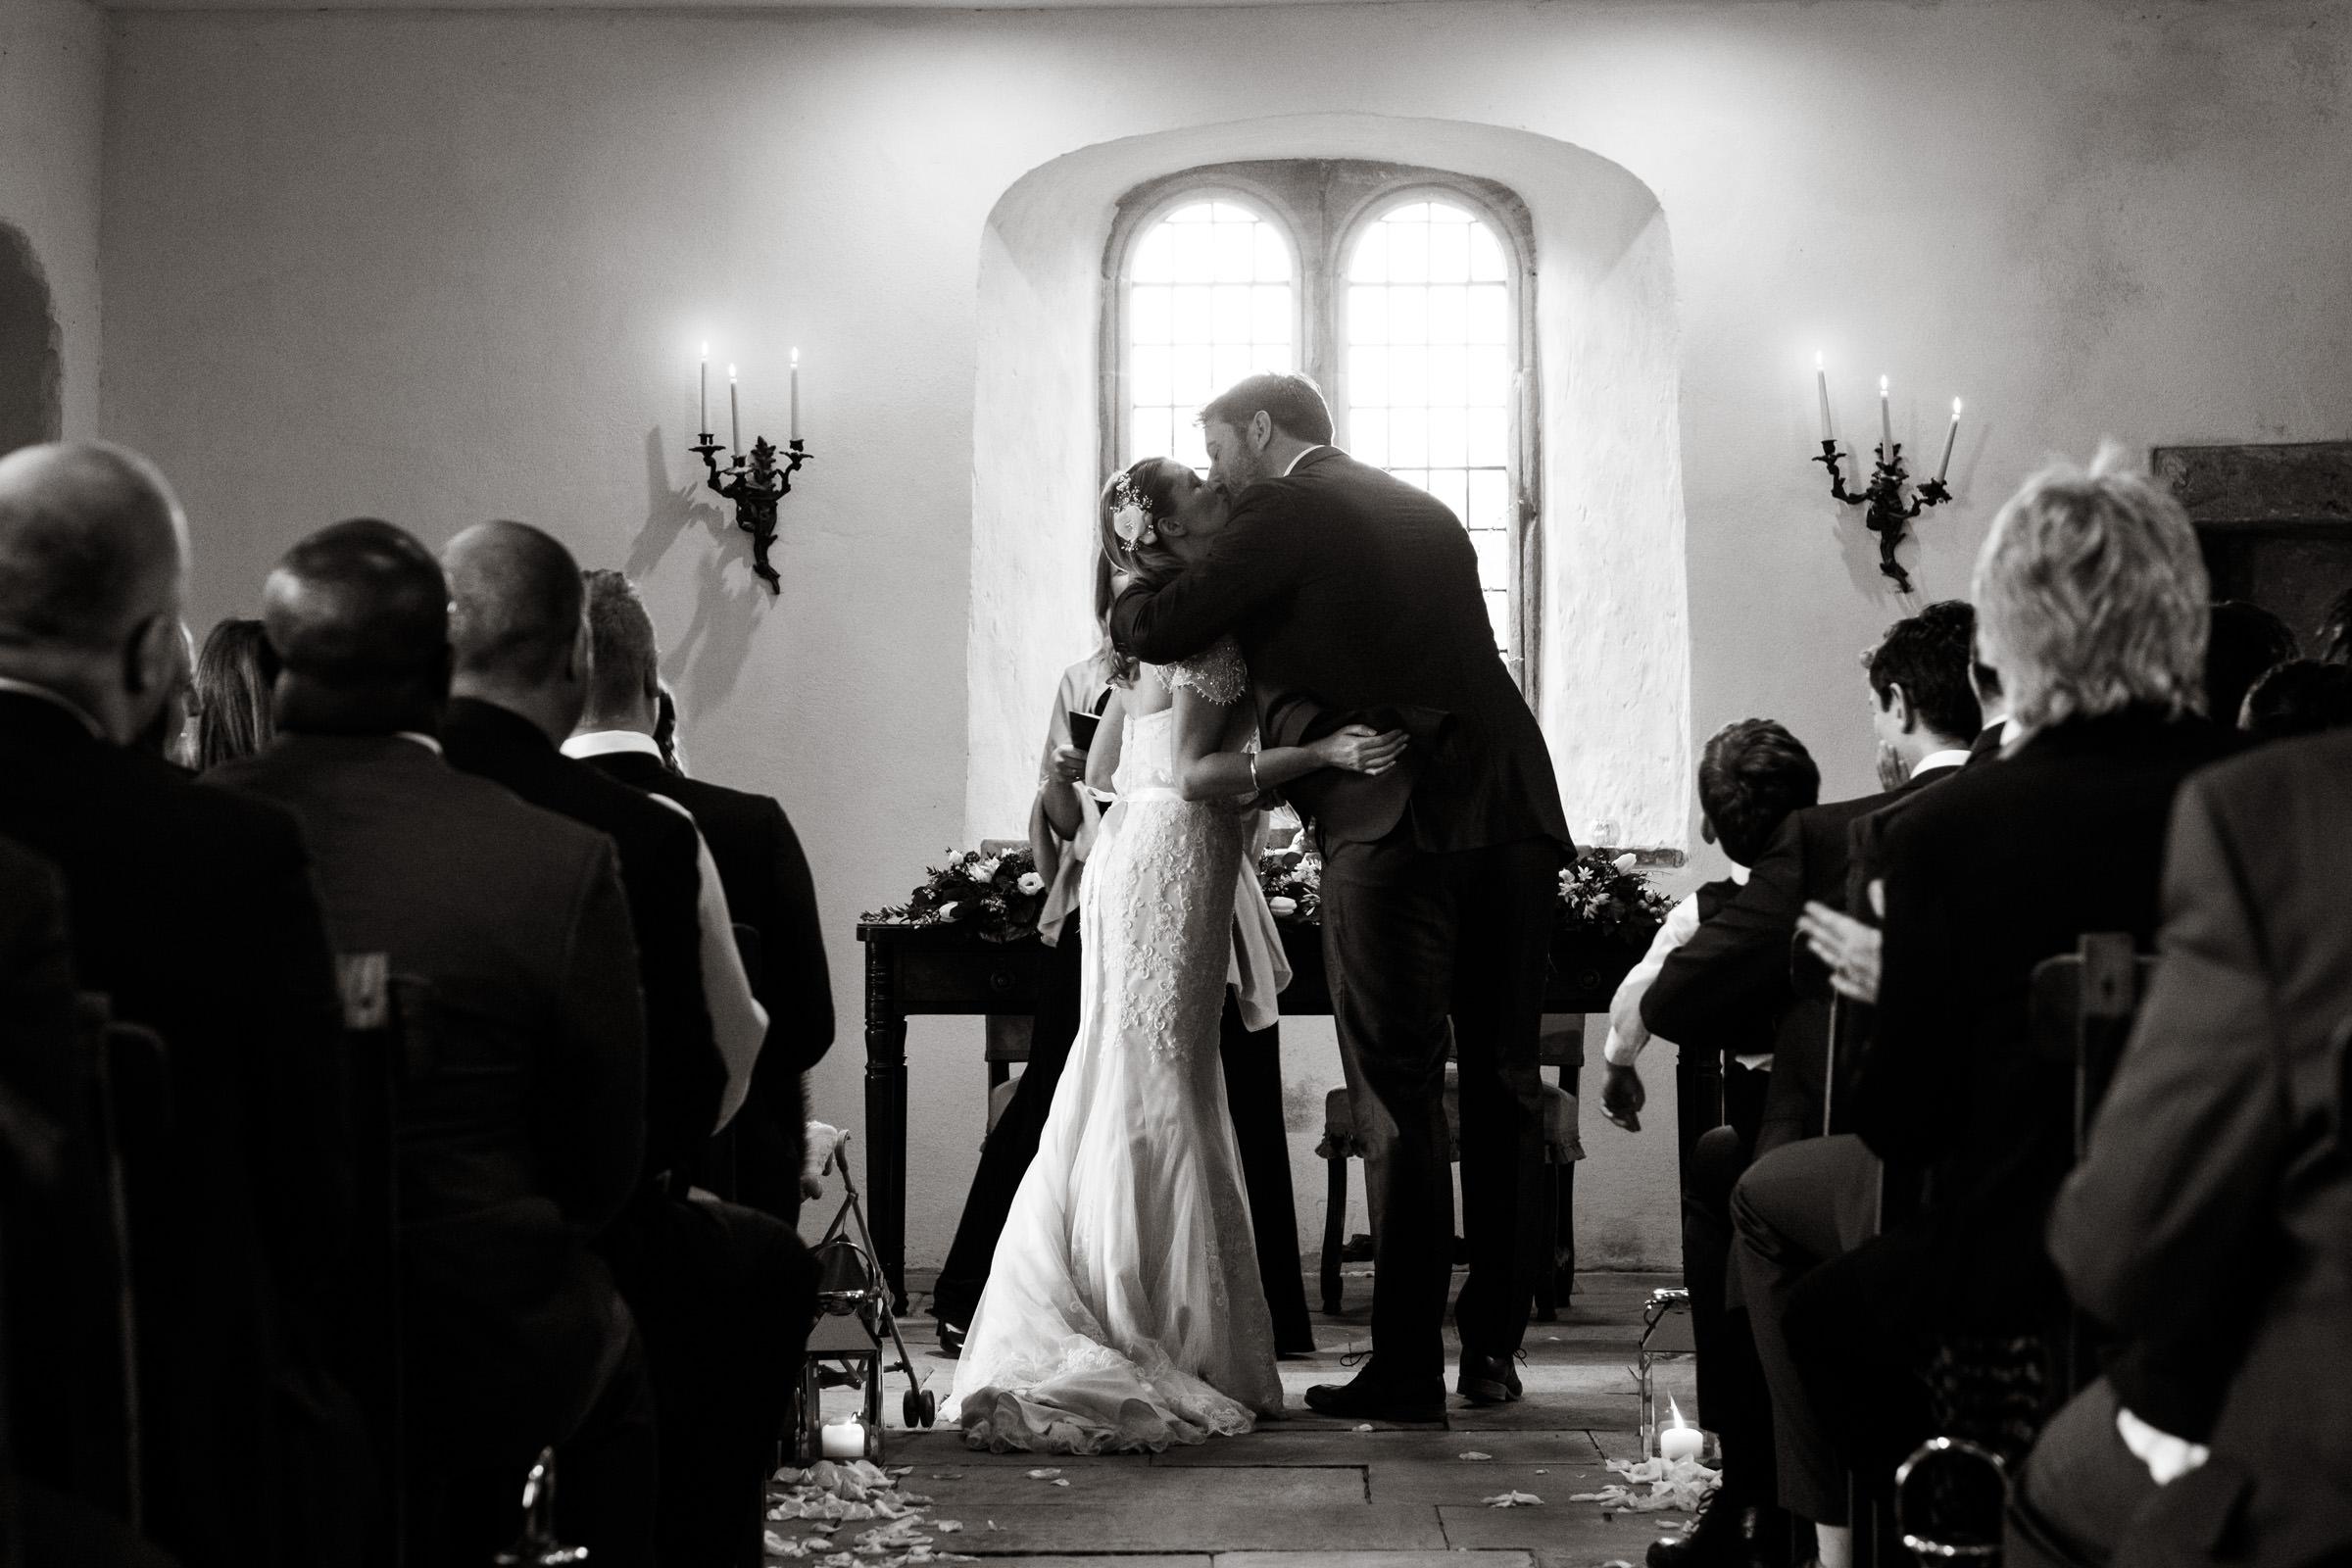 Brympton+House+Wedding+Photos+Somerset+014.jpg